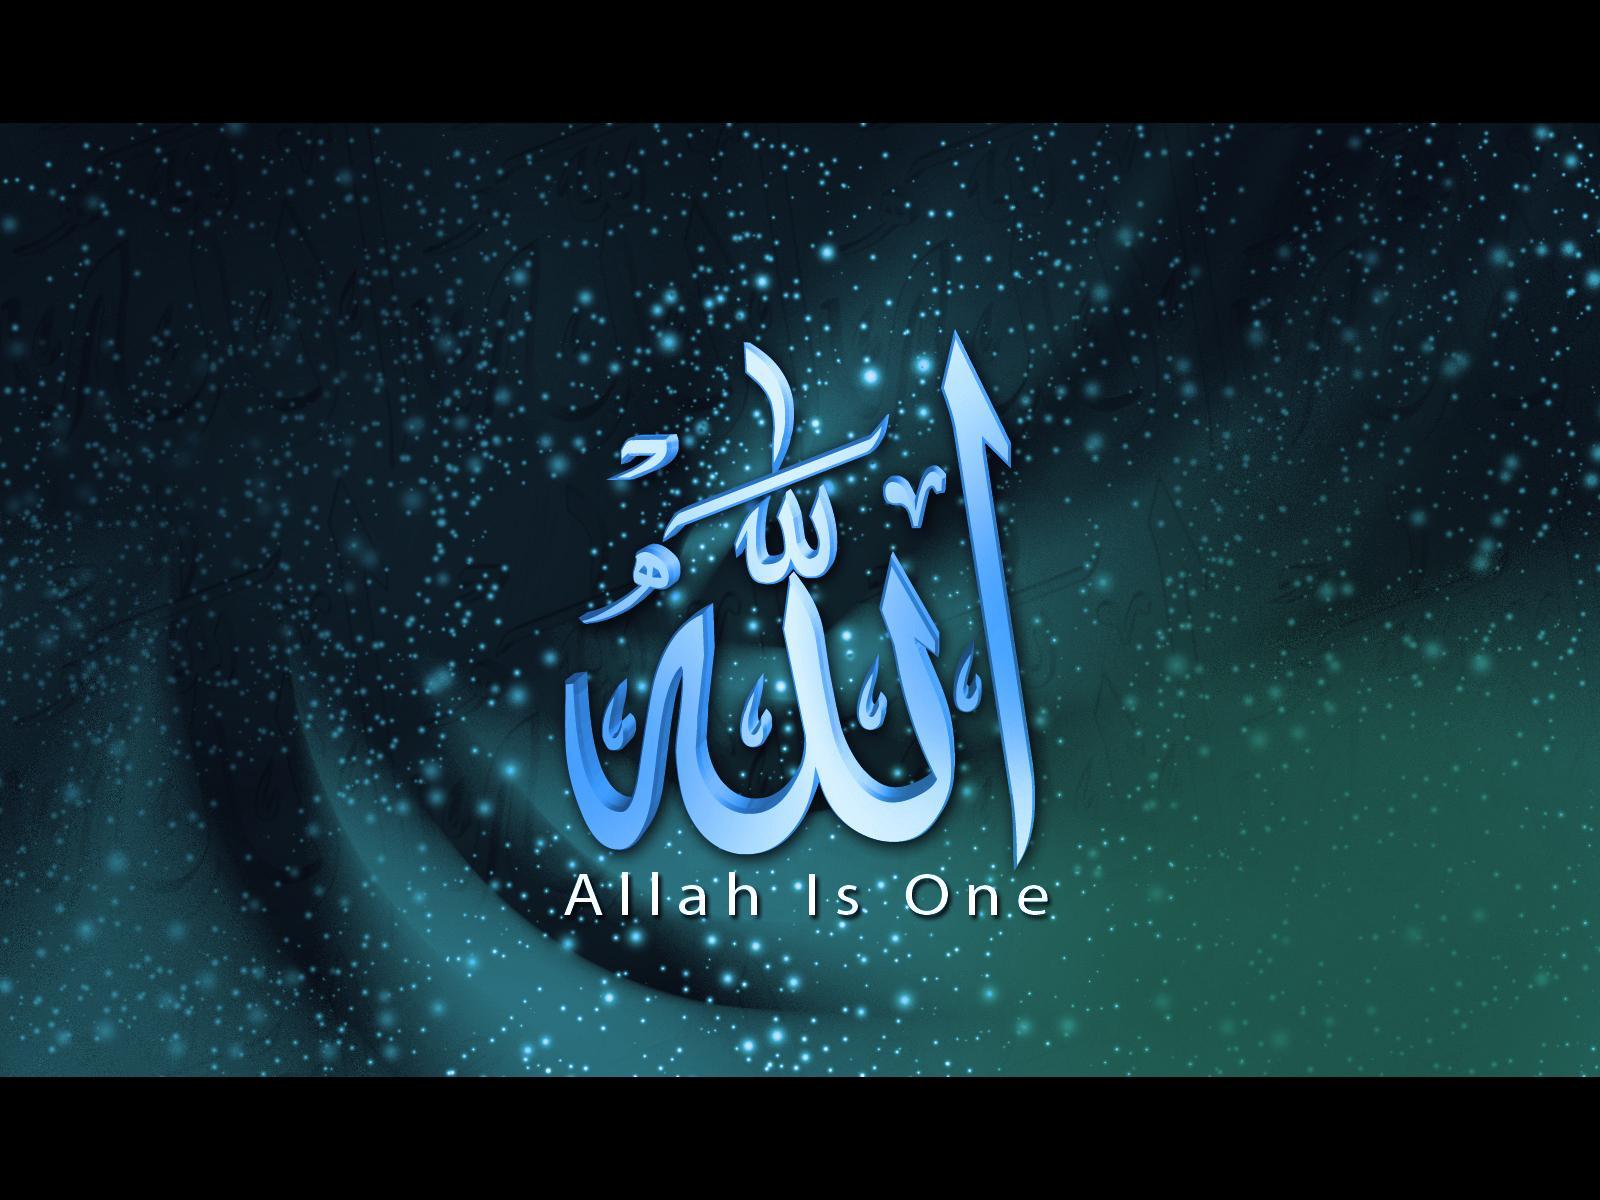 50 Allah Photos Wallpapers On Wallpapersafari